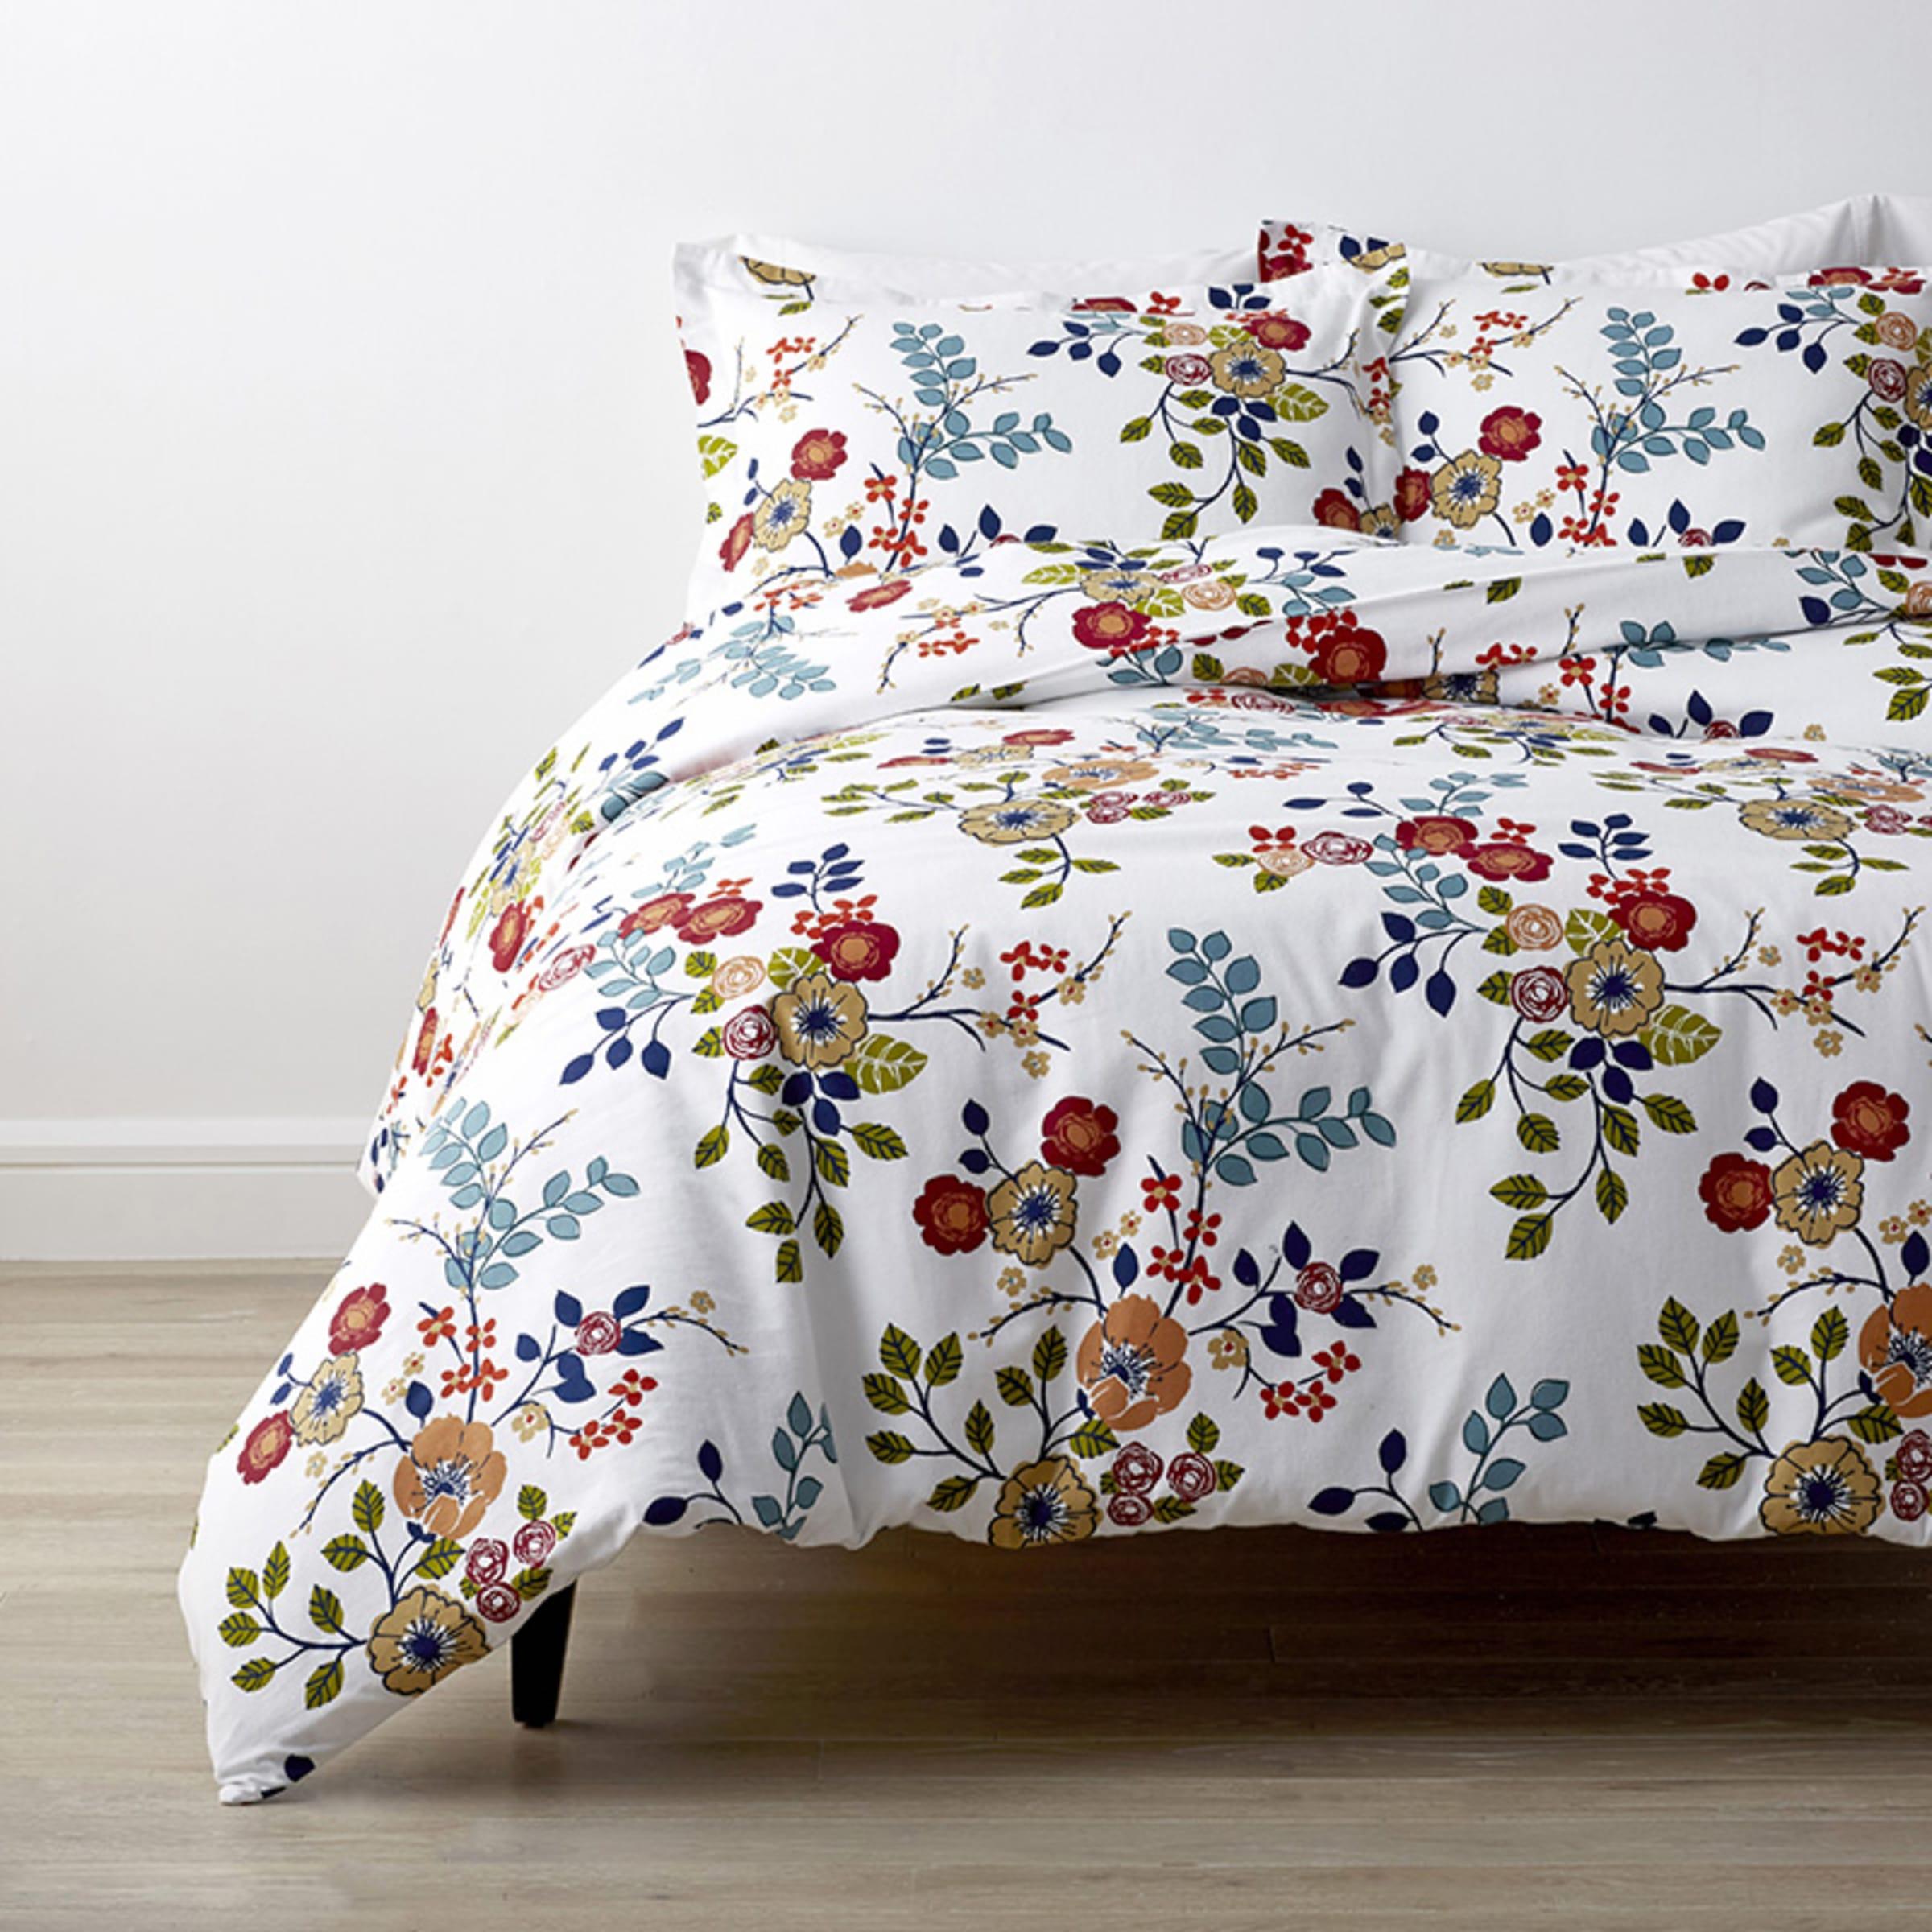 Floral Print Soft Flannel Duvet Cover